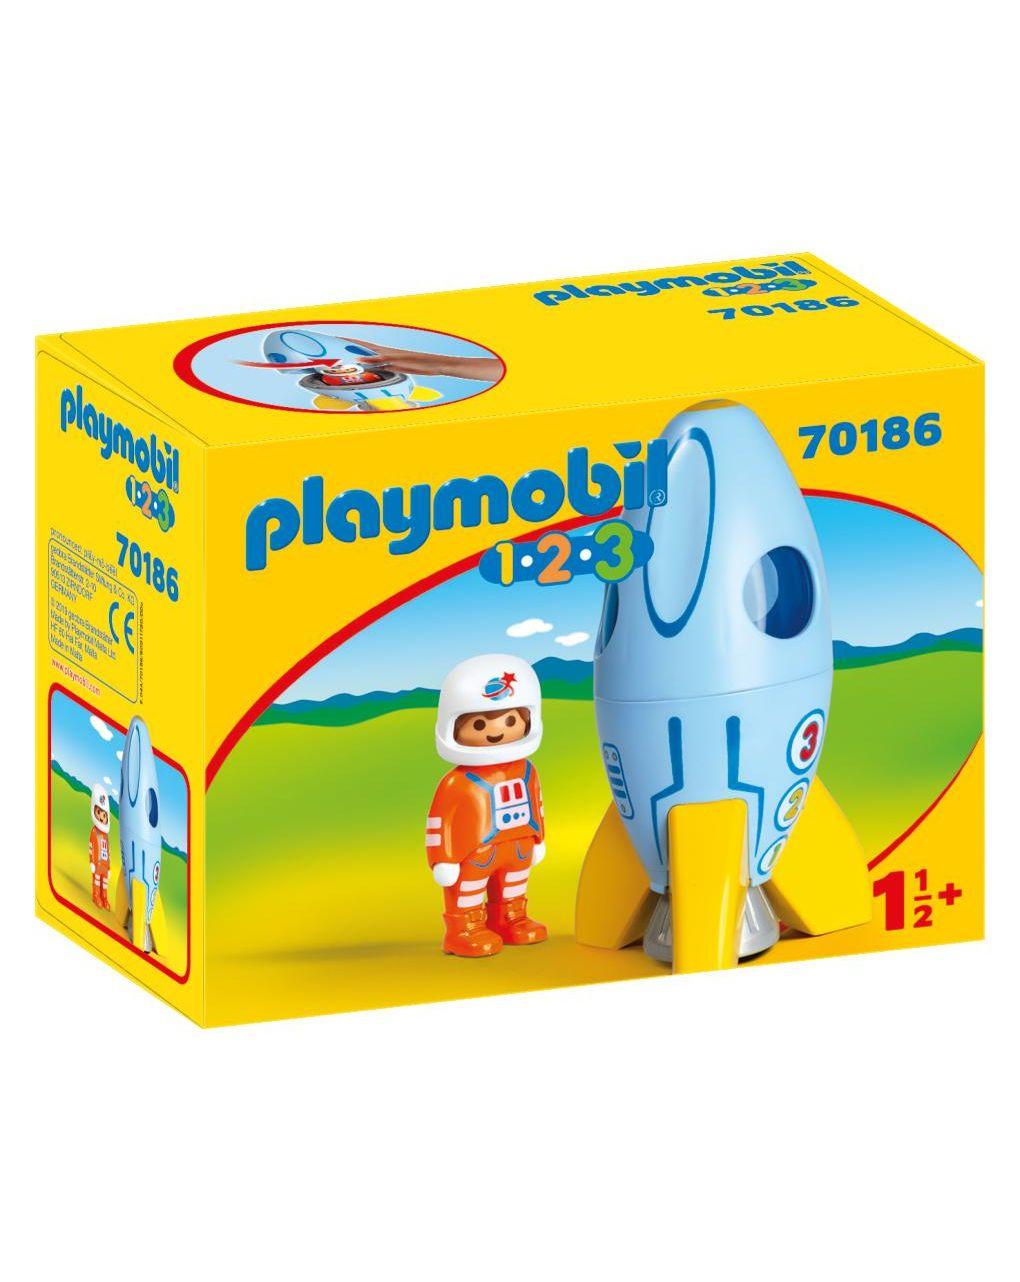 Playmobil - razzo con astronauta 1.2.3 - Playmobil